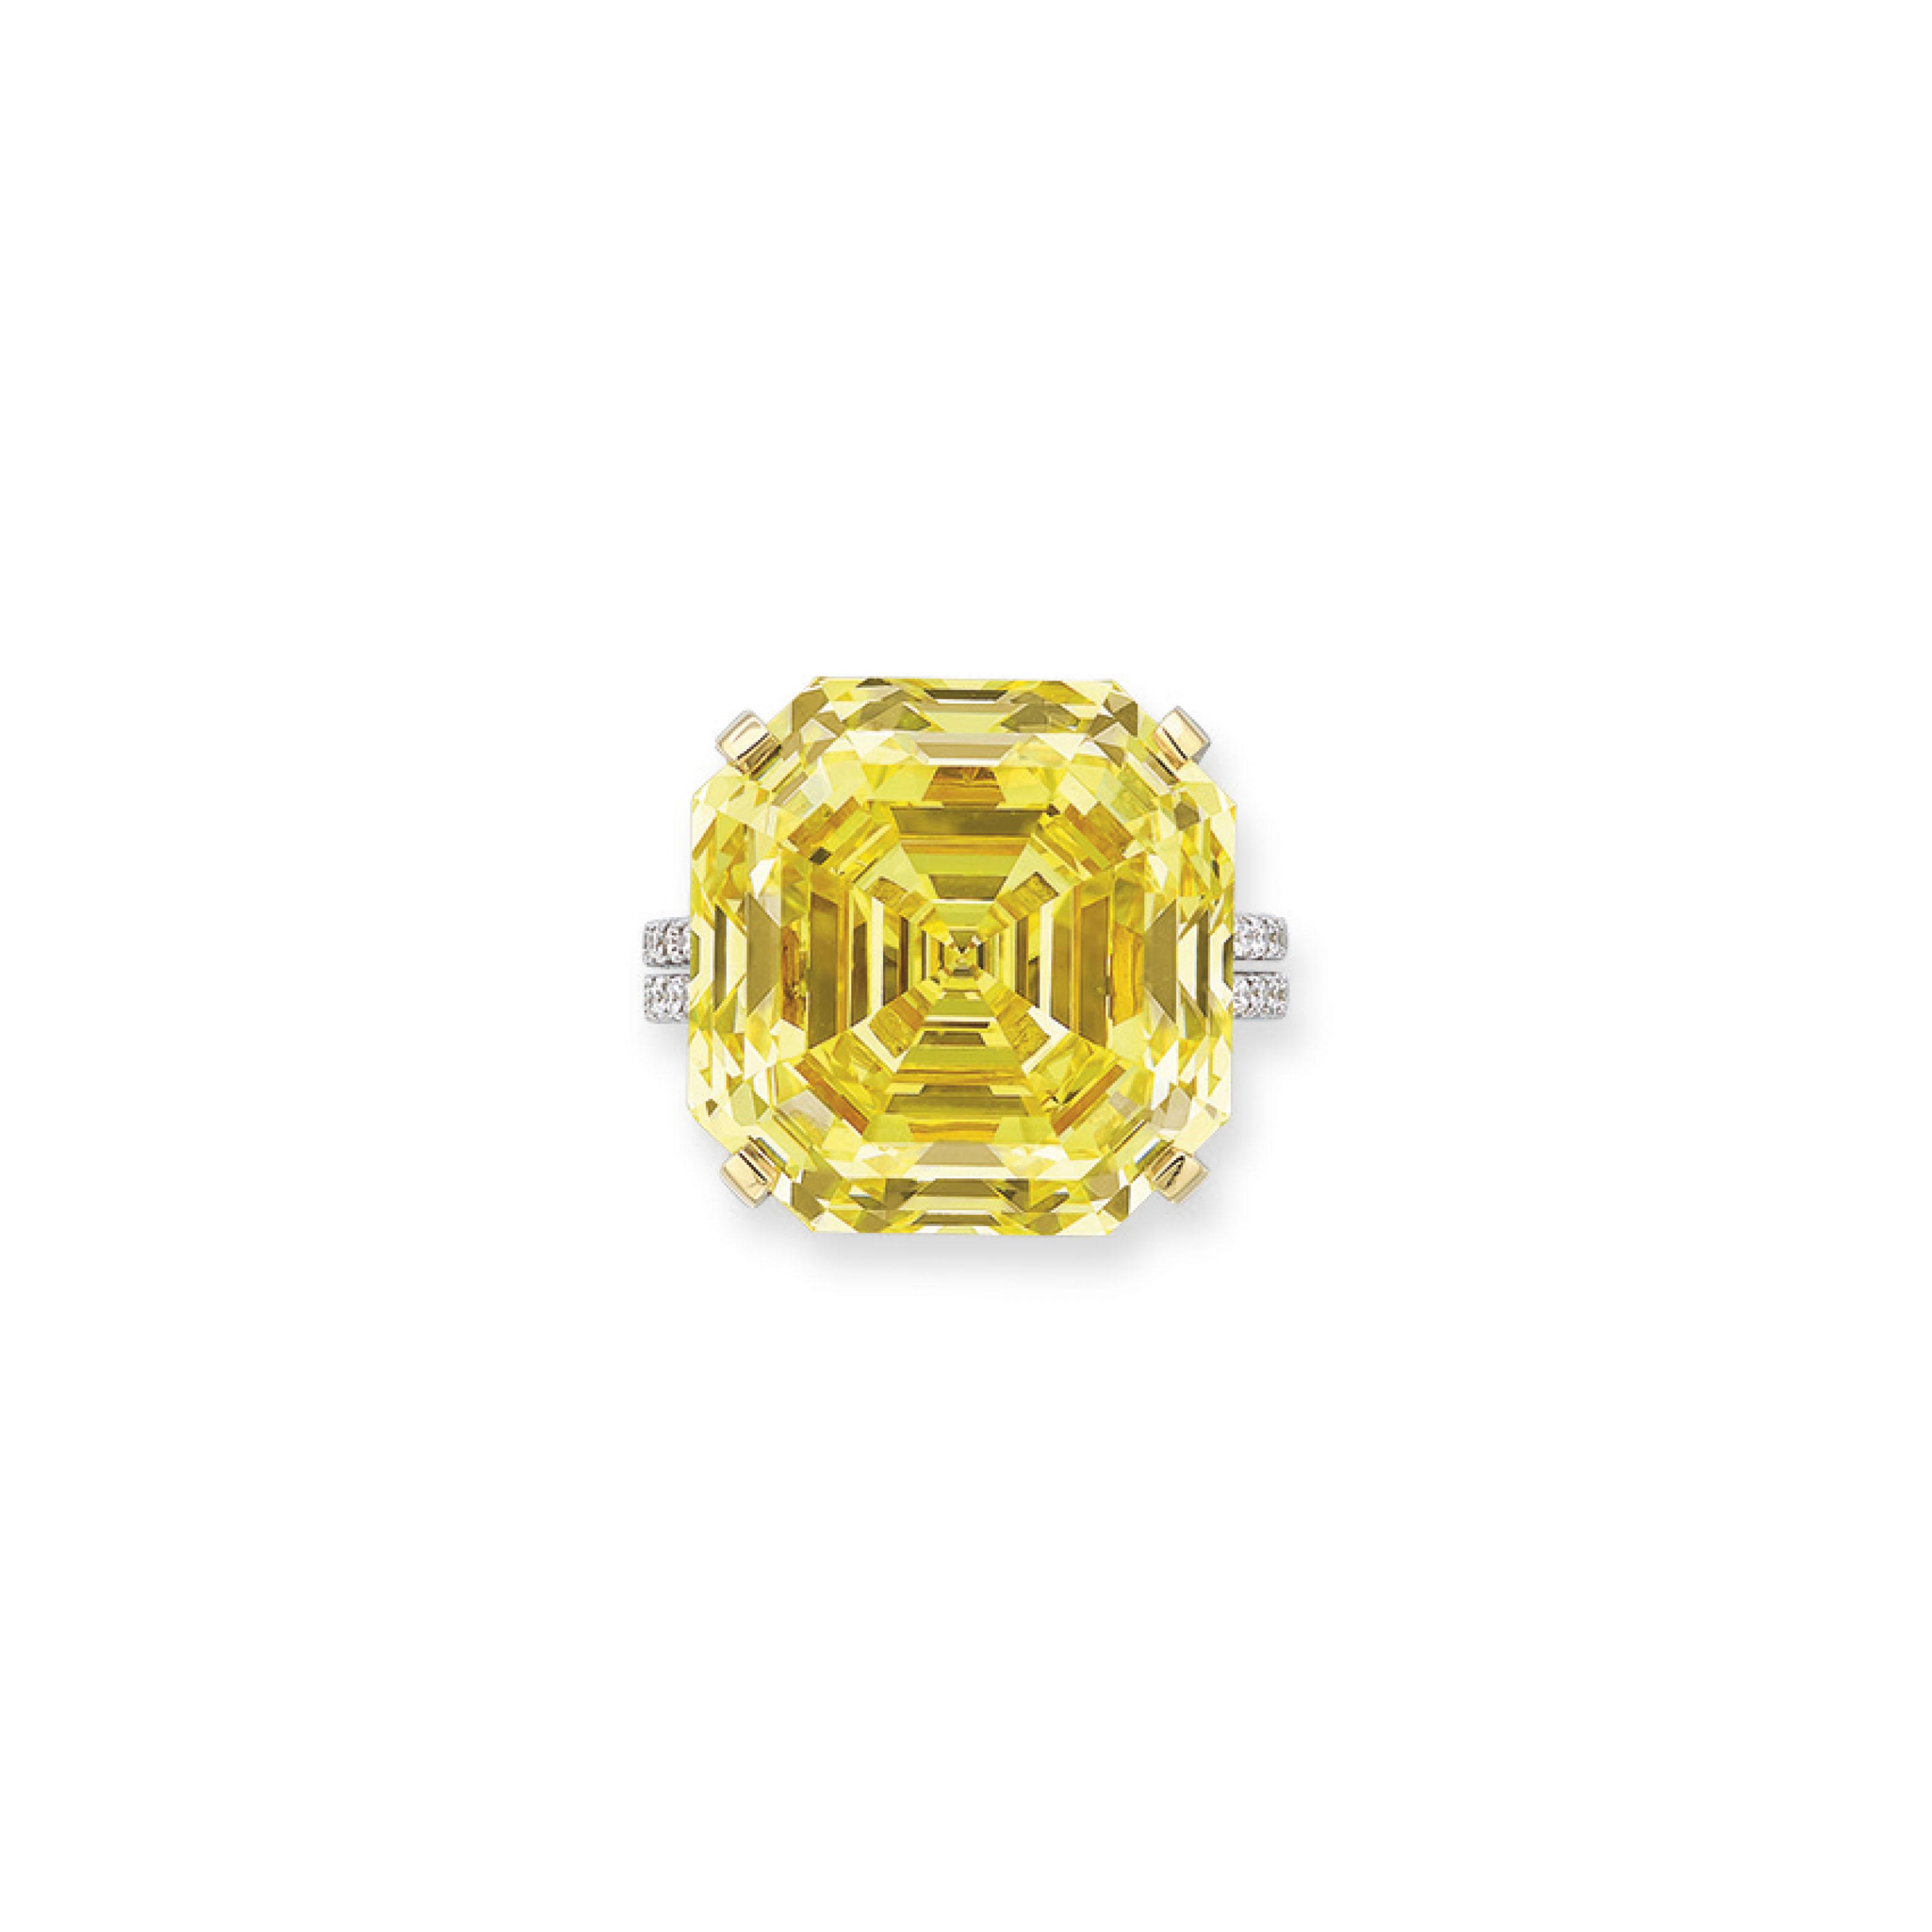 Fancy Vivid Yellow diamond ring of 31.17 caratsPrice Realised: HK$16,690,000 / US$2,160,079